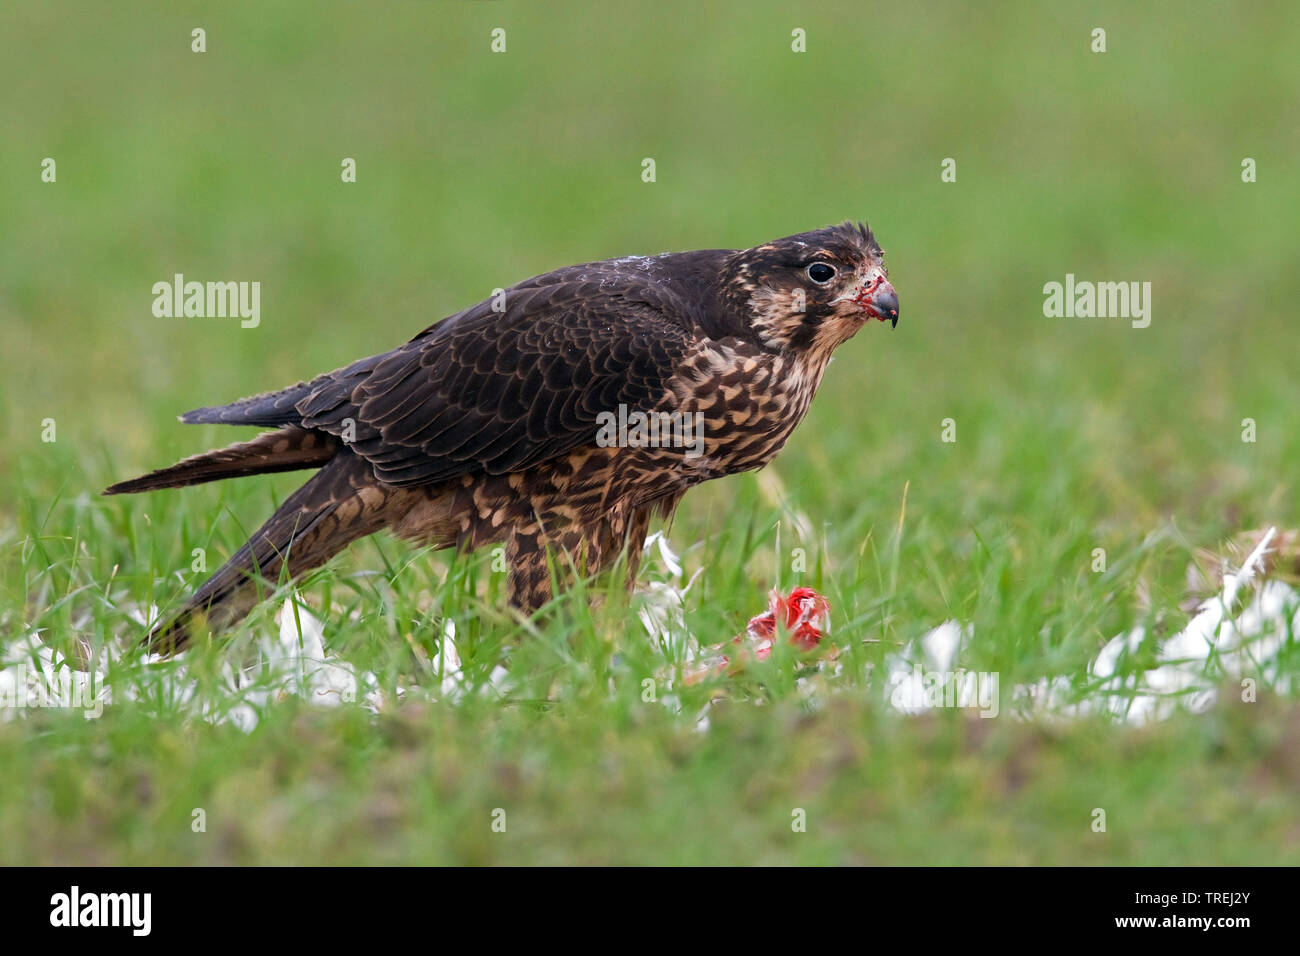 Wanderfalke, Wander-Falke (Falco peregrinus), im Flug, Italien   peregrine falcon (Falco peregrinus), in flight, Italy   BLWS527271.jpg [ (c) blickwin - Stock Image